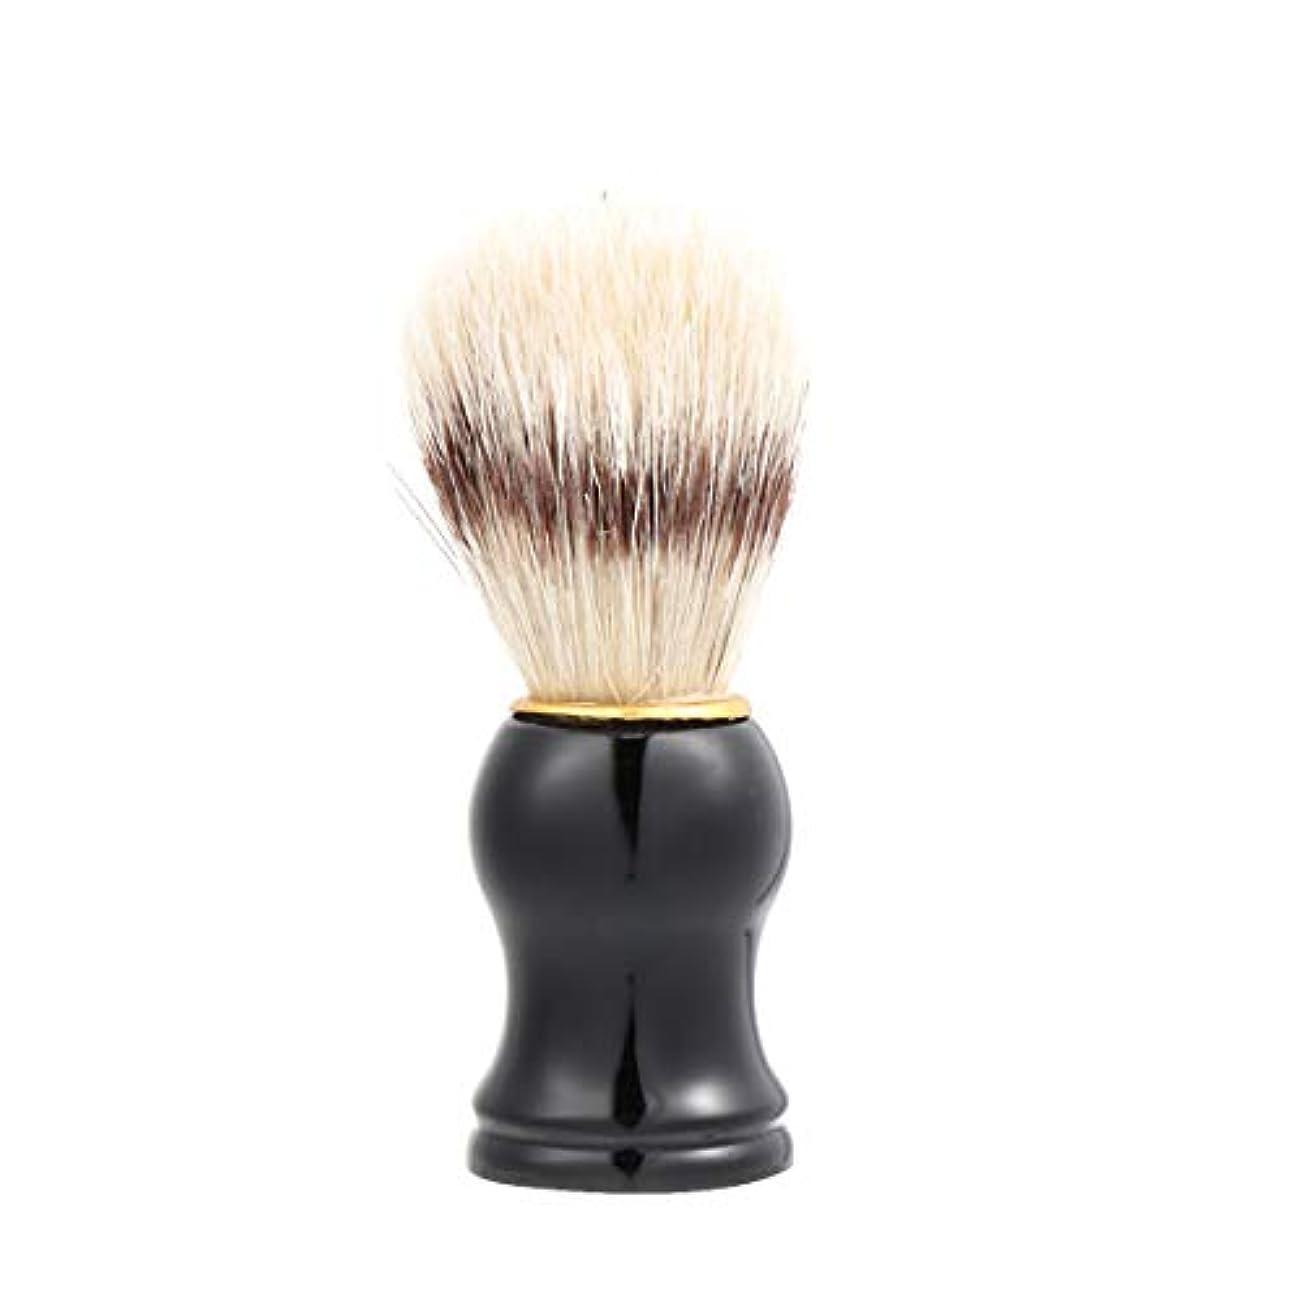 Lurrose 男性の剃毛ブラシ 毛髭ひげ 剃毛ブラシ ソフト フェイシャルケア ヘアクレンジングブラシ